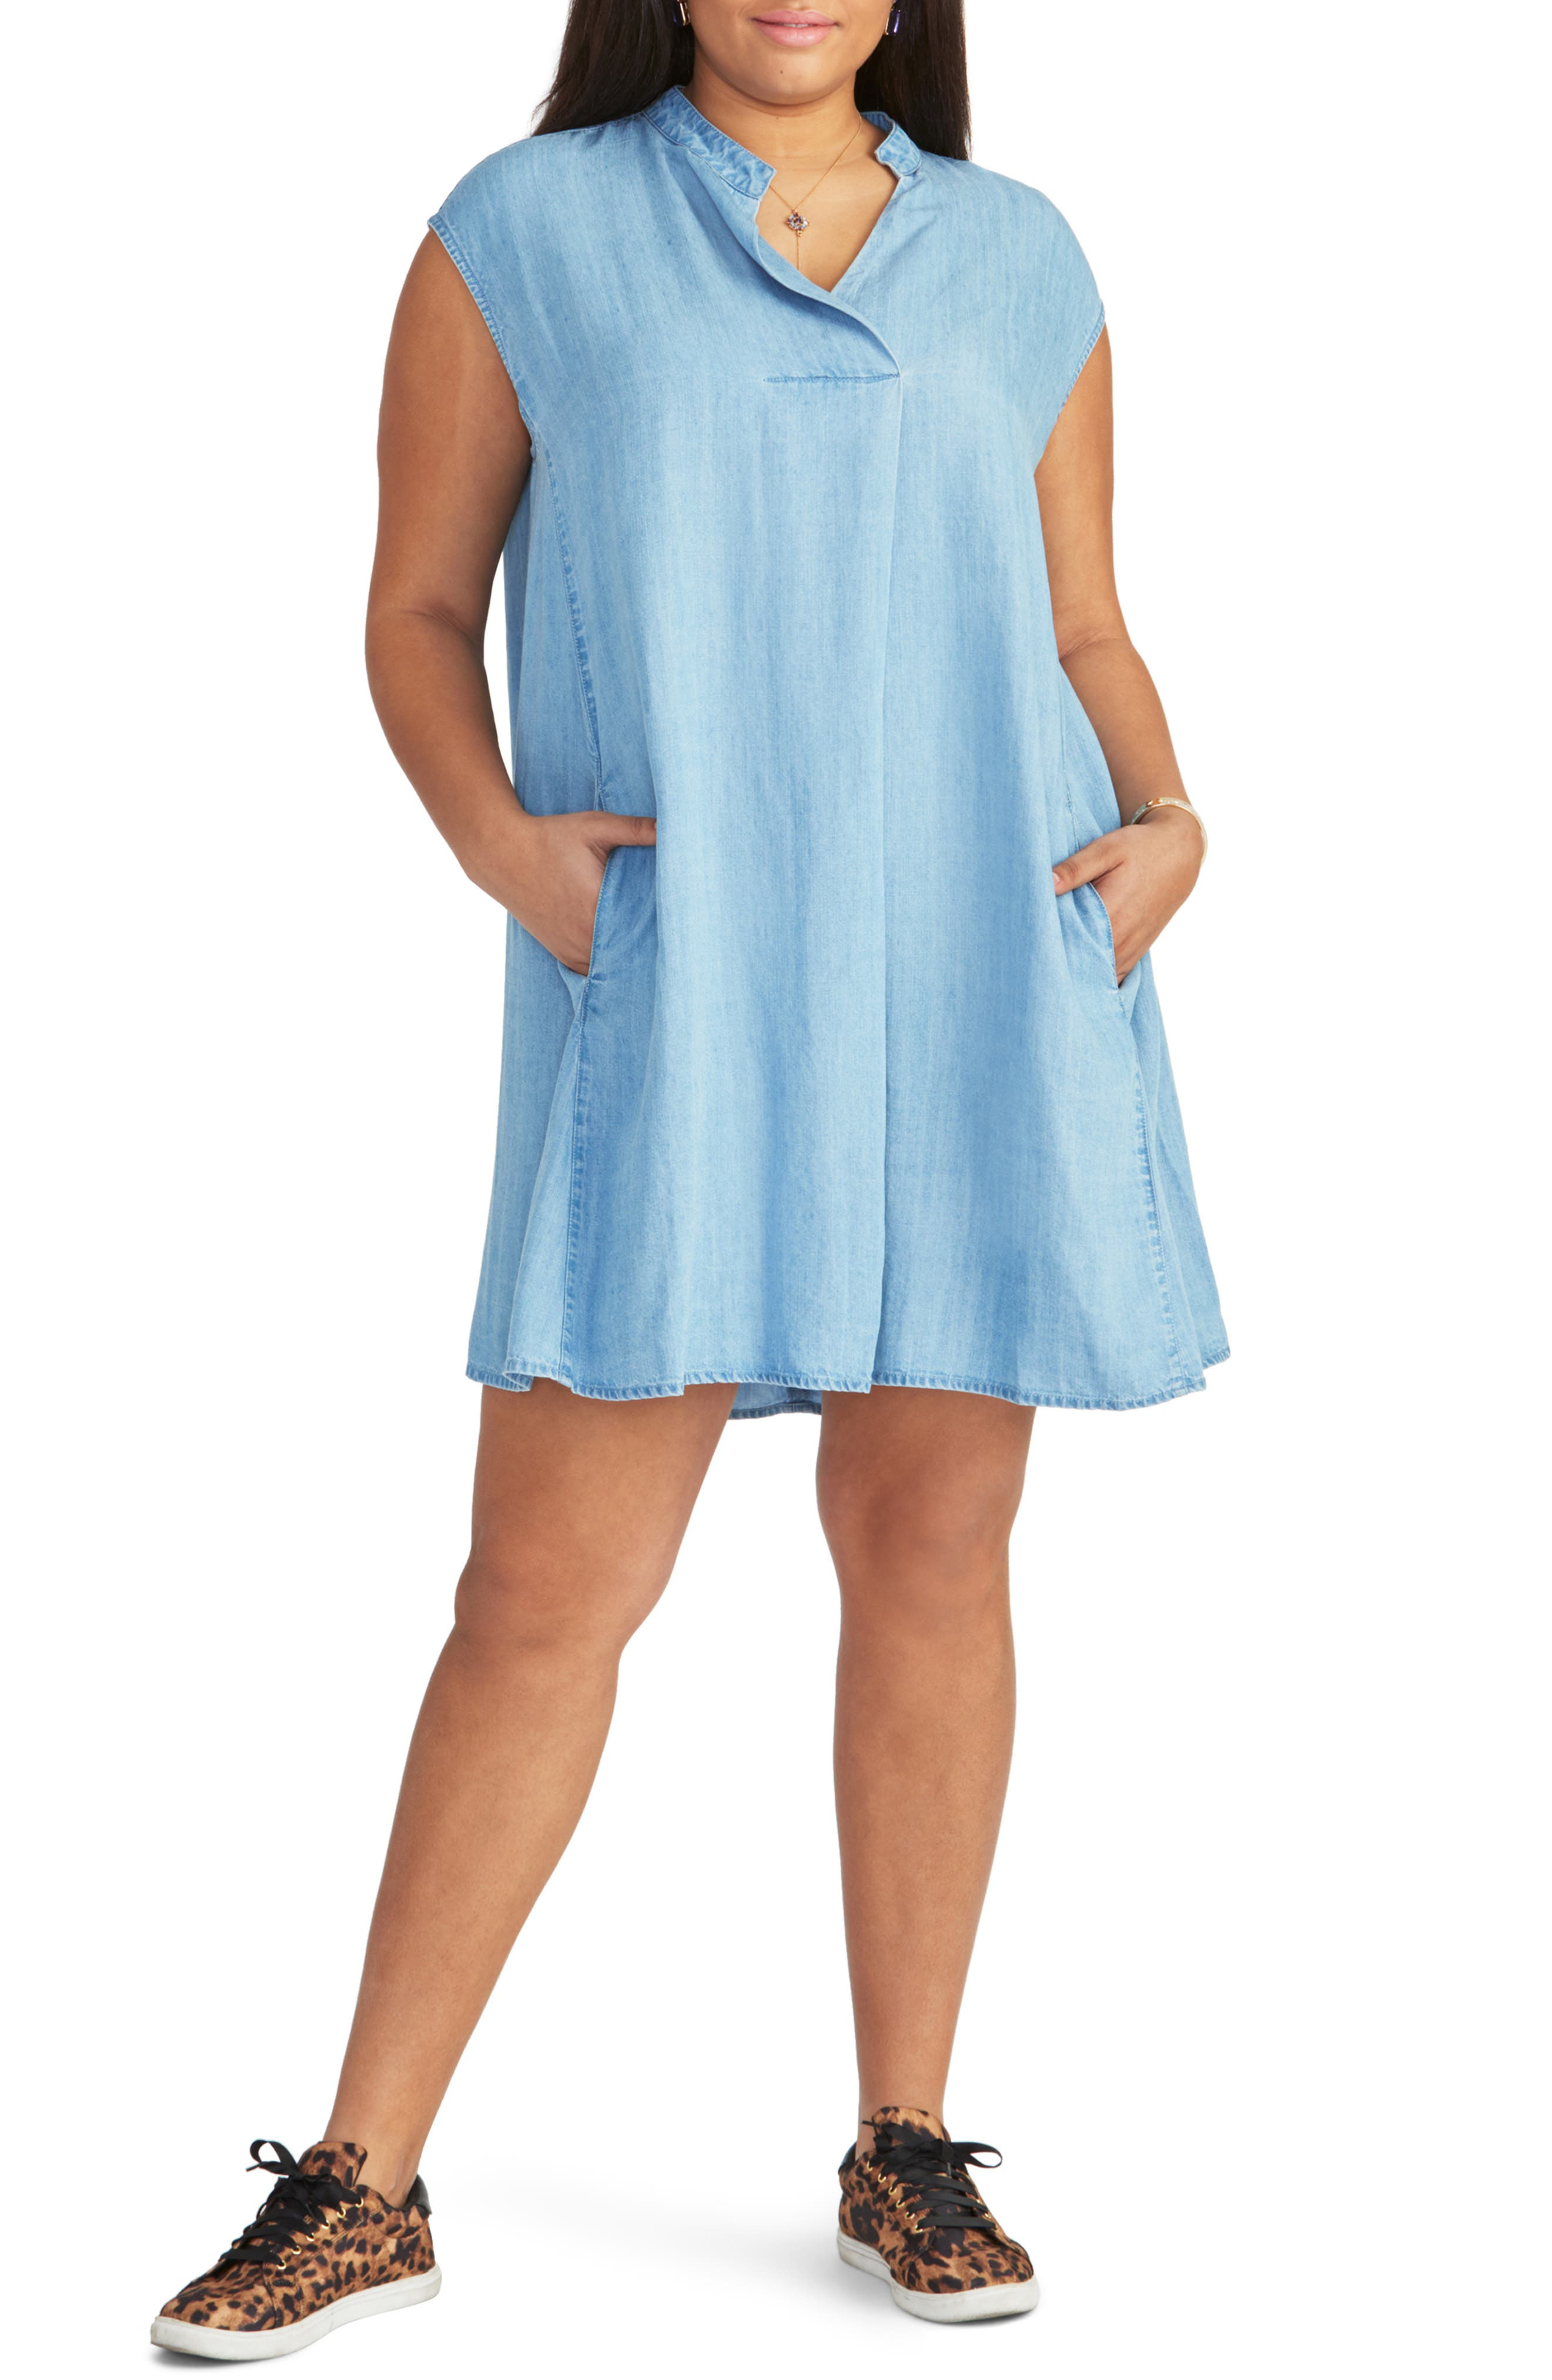 Plus Size Rachel Rachel Roy Chambray Shift Dress, Blue